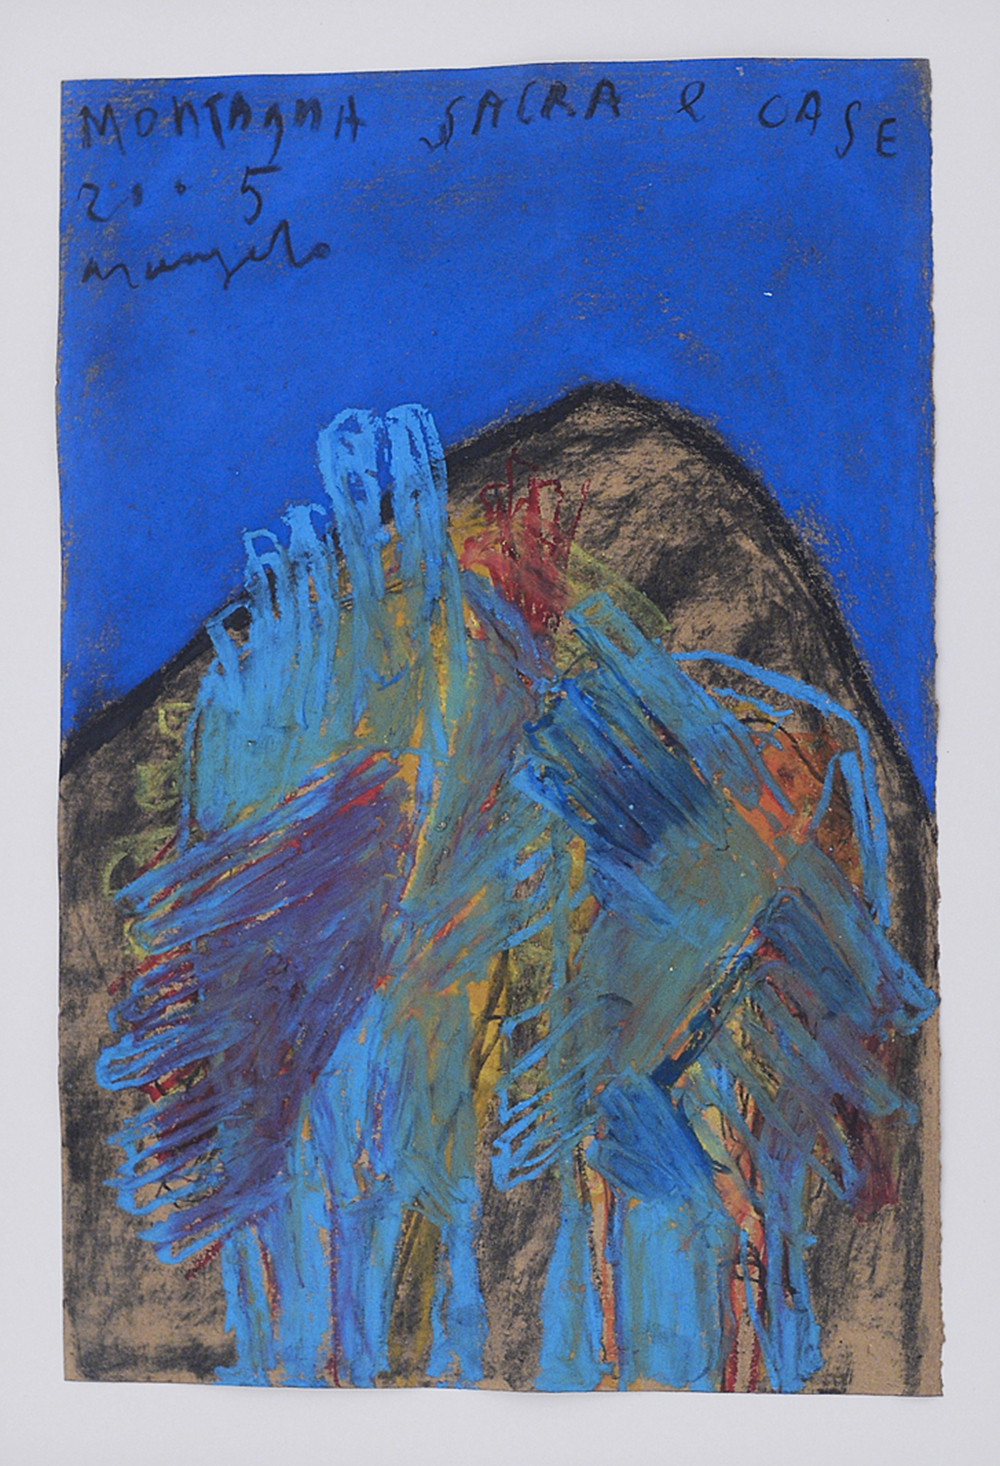 Montagna sacra e case, 2005, tecnica mista su carta, cm 41x27